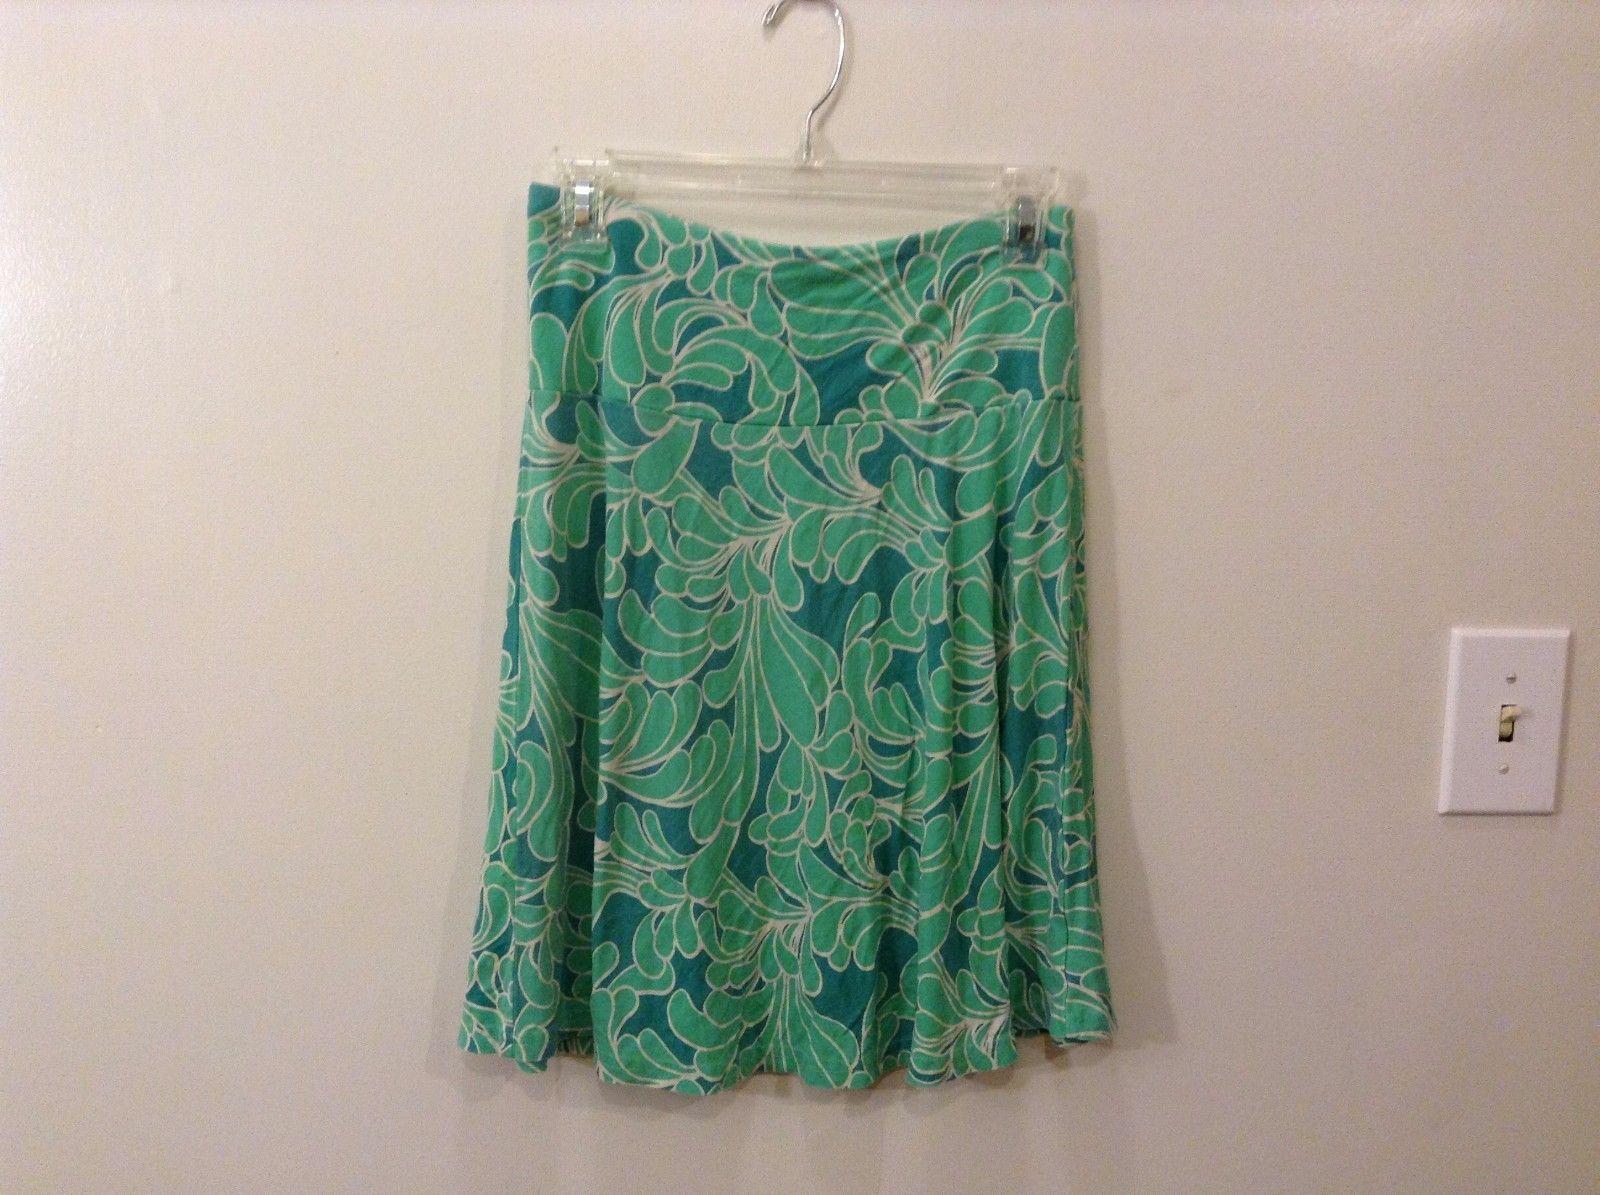 H&M Size 4 Up to Knee Elastic Waist Skirt Aquamarine Turquoise Colorful Design